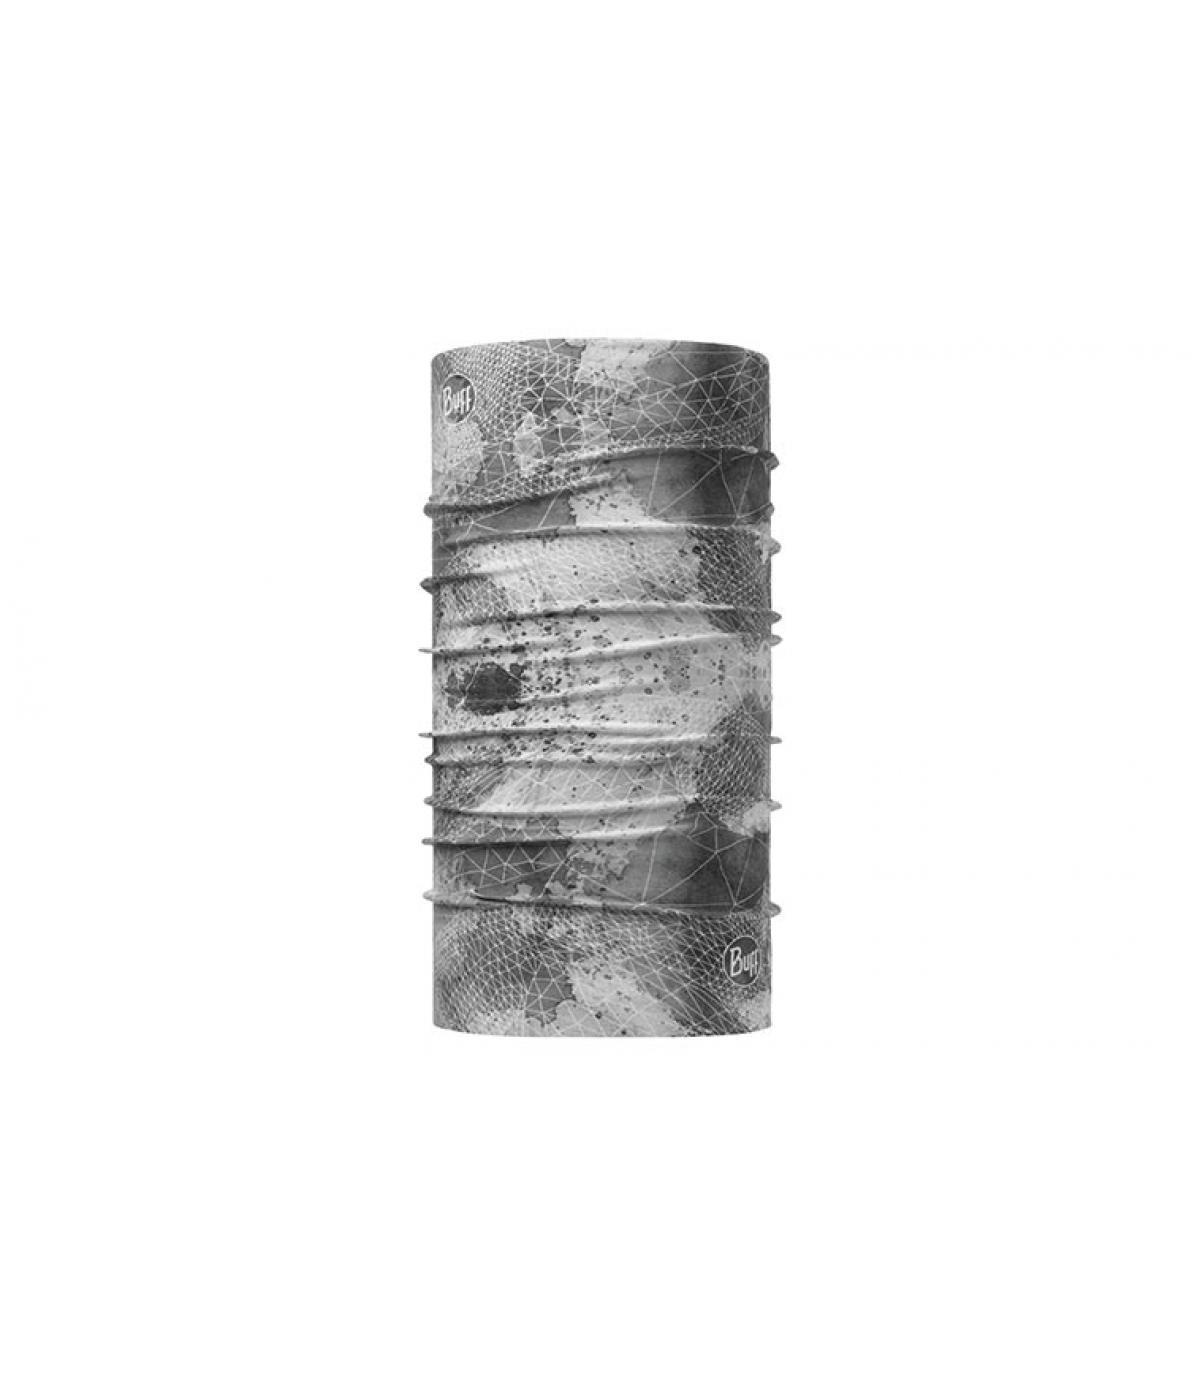 Buff gris claro impreso